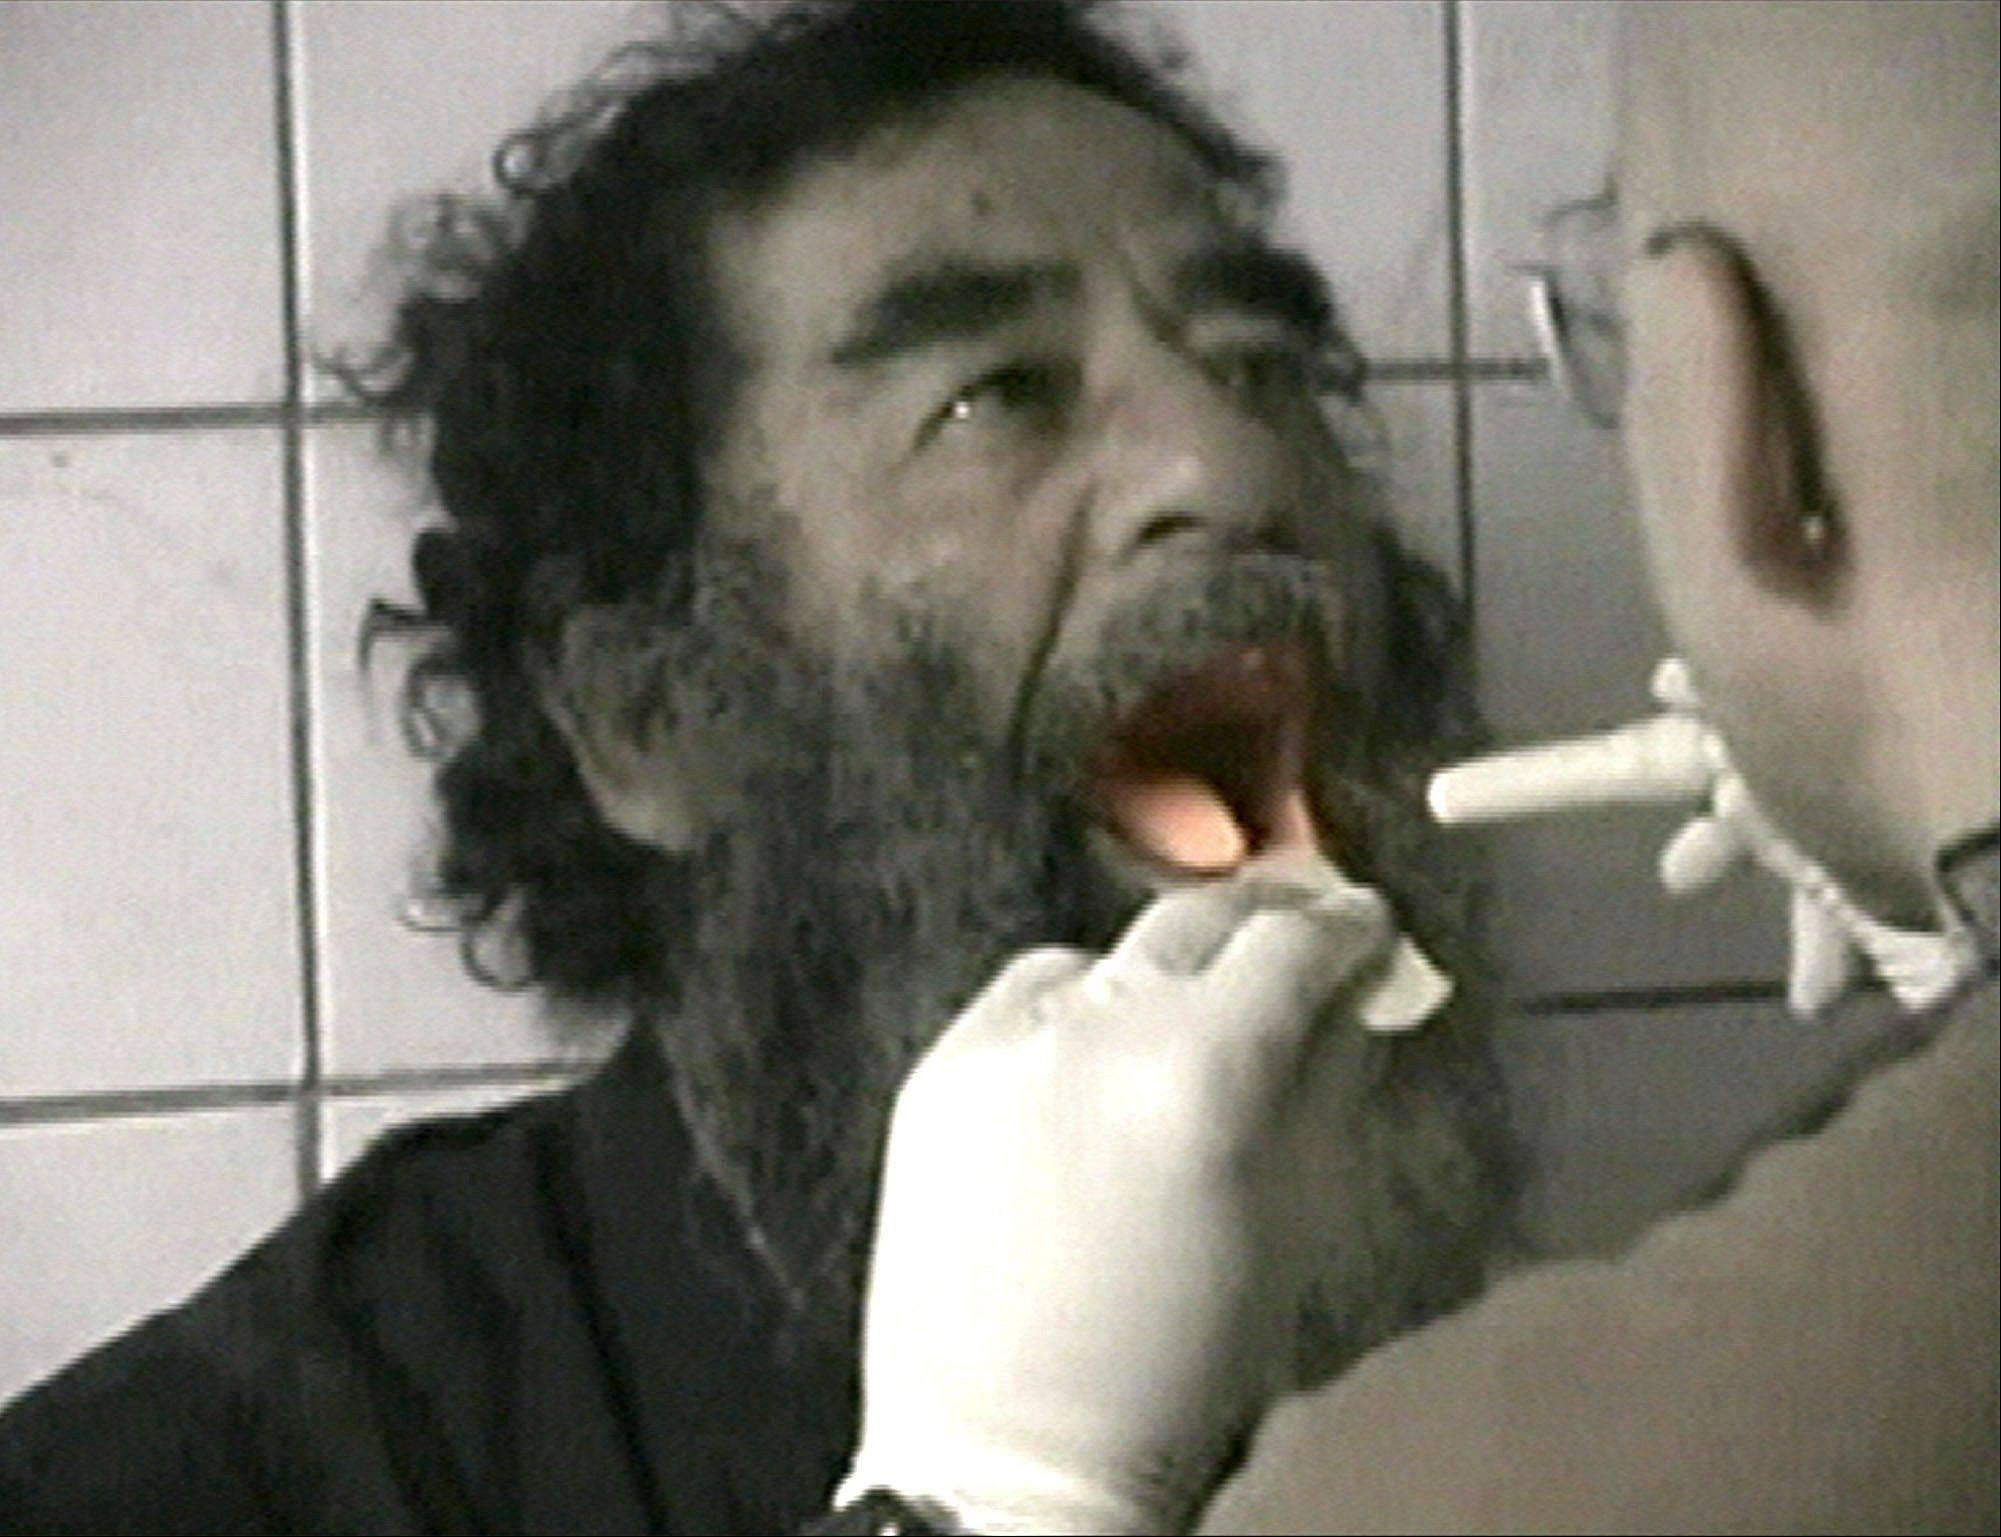 Uday Hussein Money Saddam Hussein undergoes a